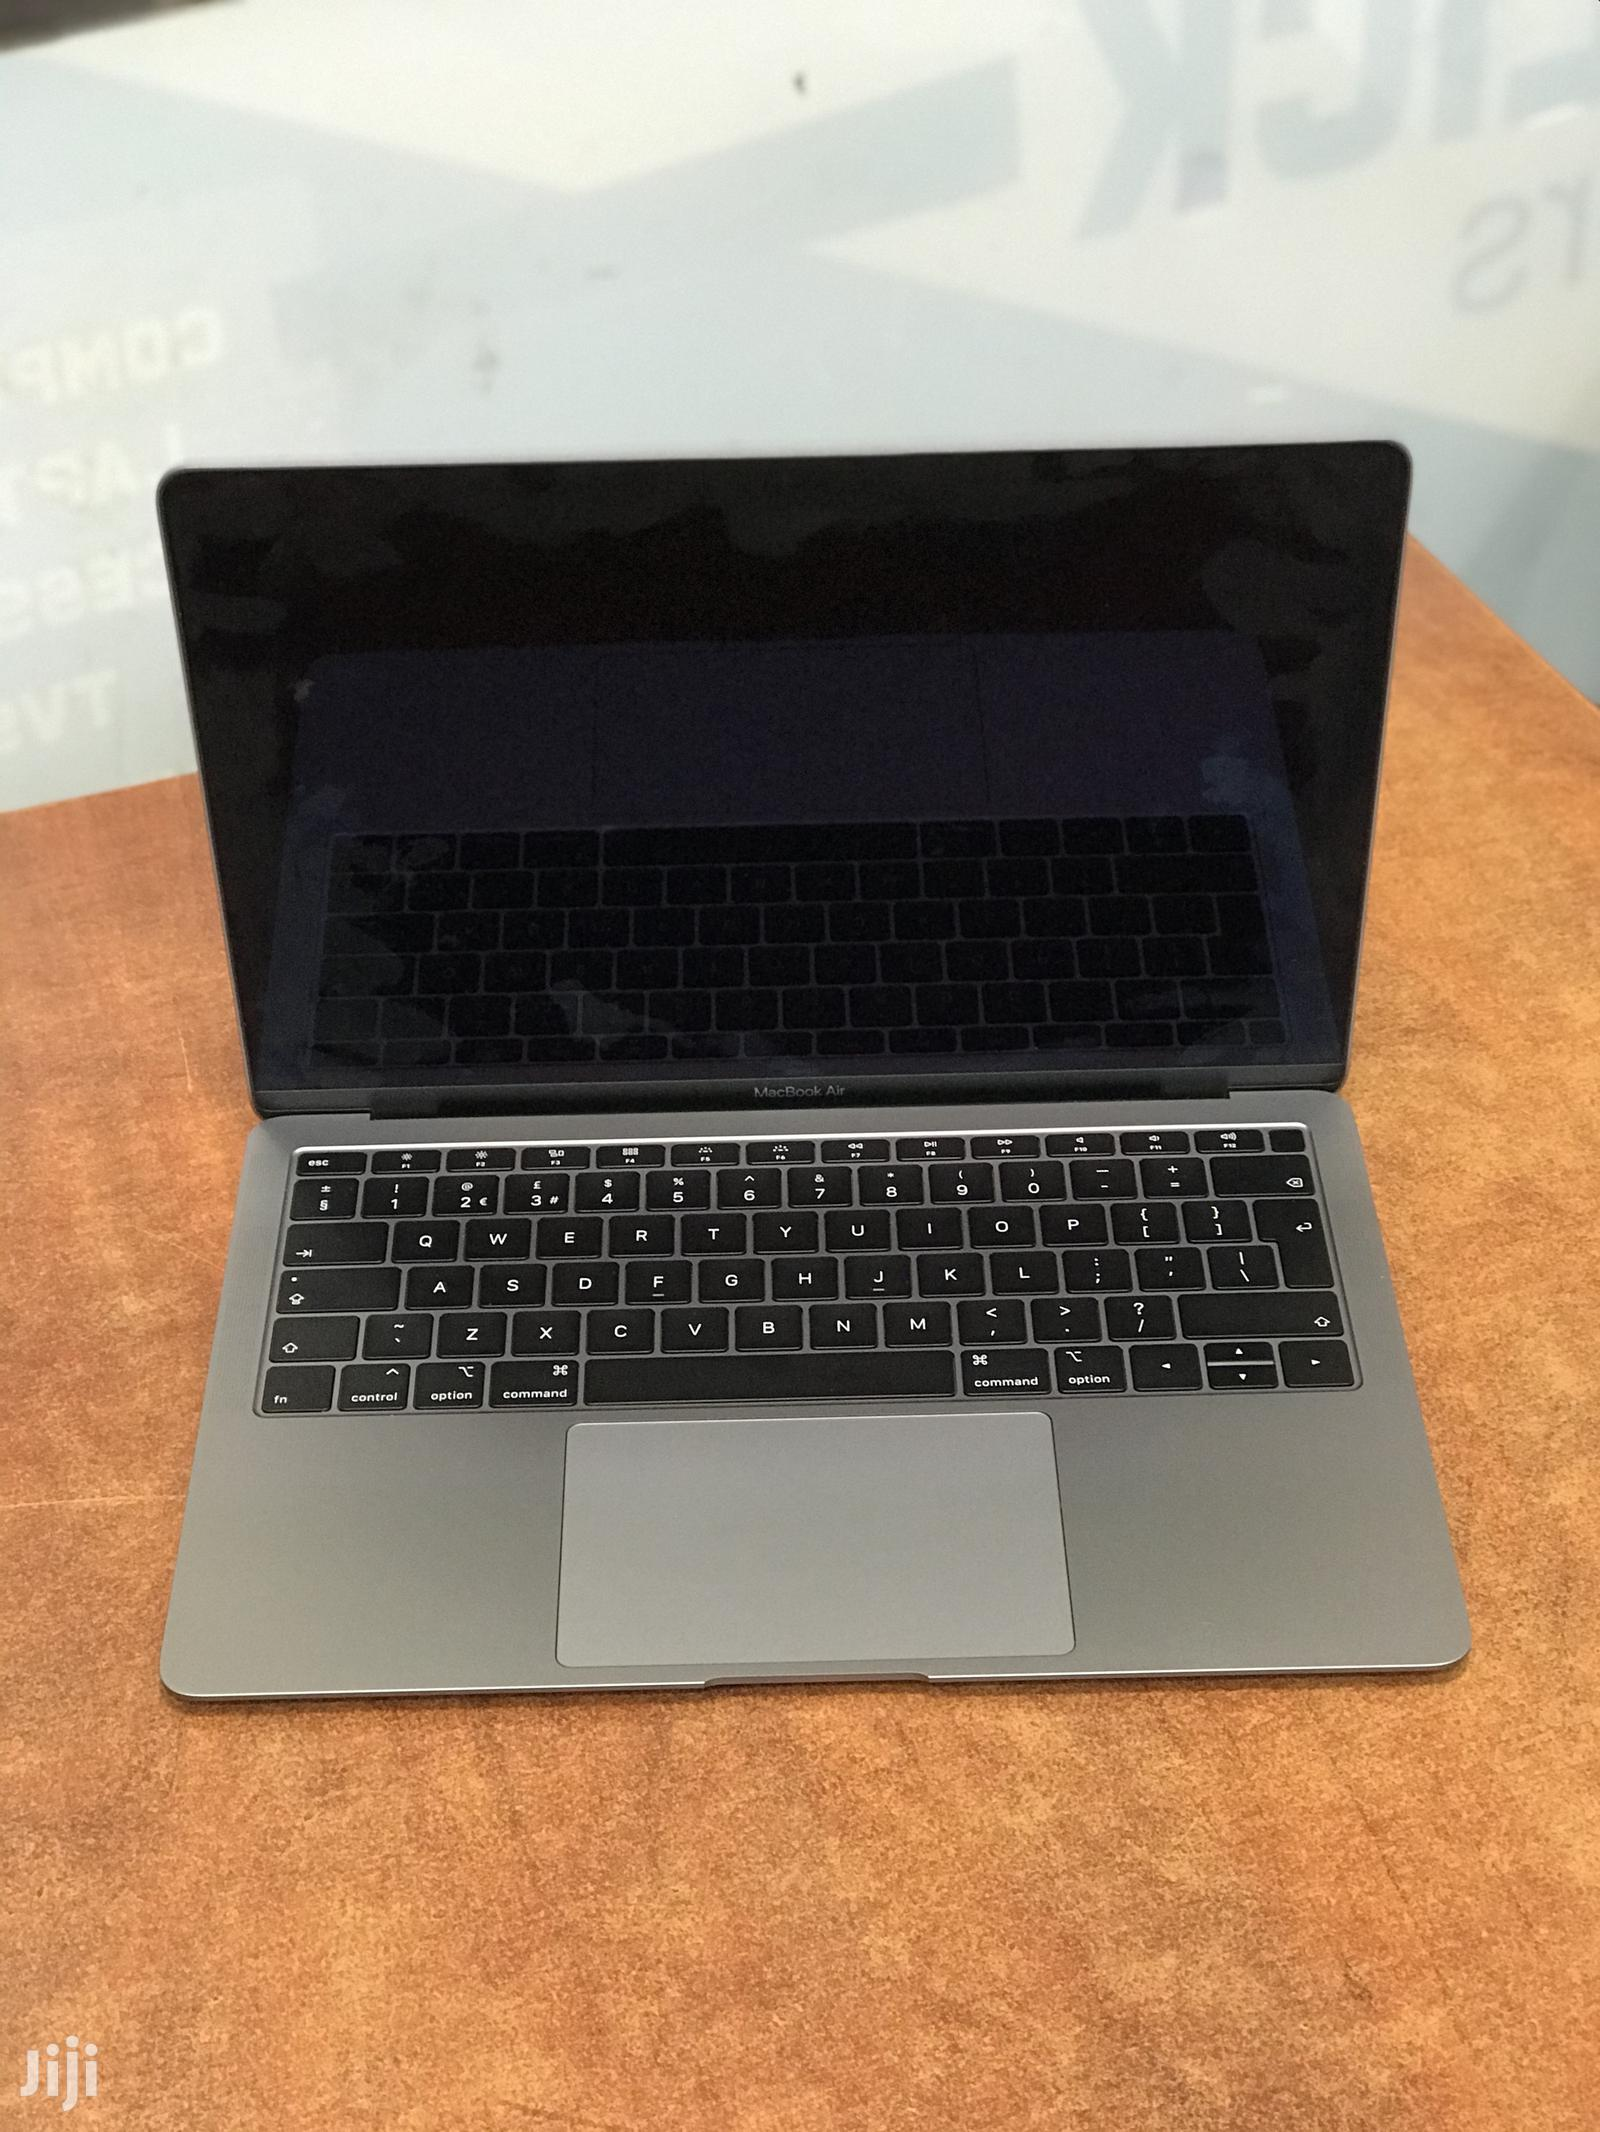 New Laptop Apple MacBook Air 8GB Intel Core I5 SSHD (Hybrid) 128GB